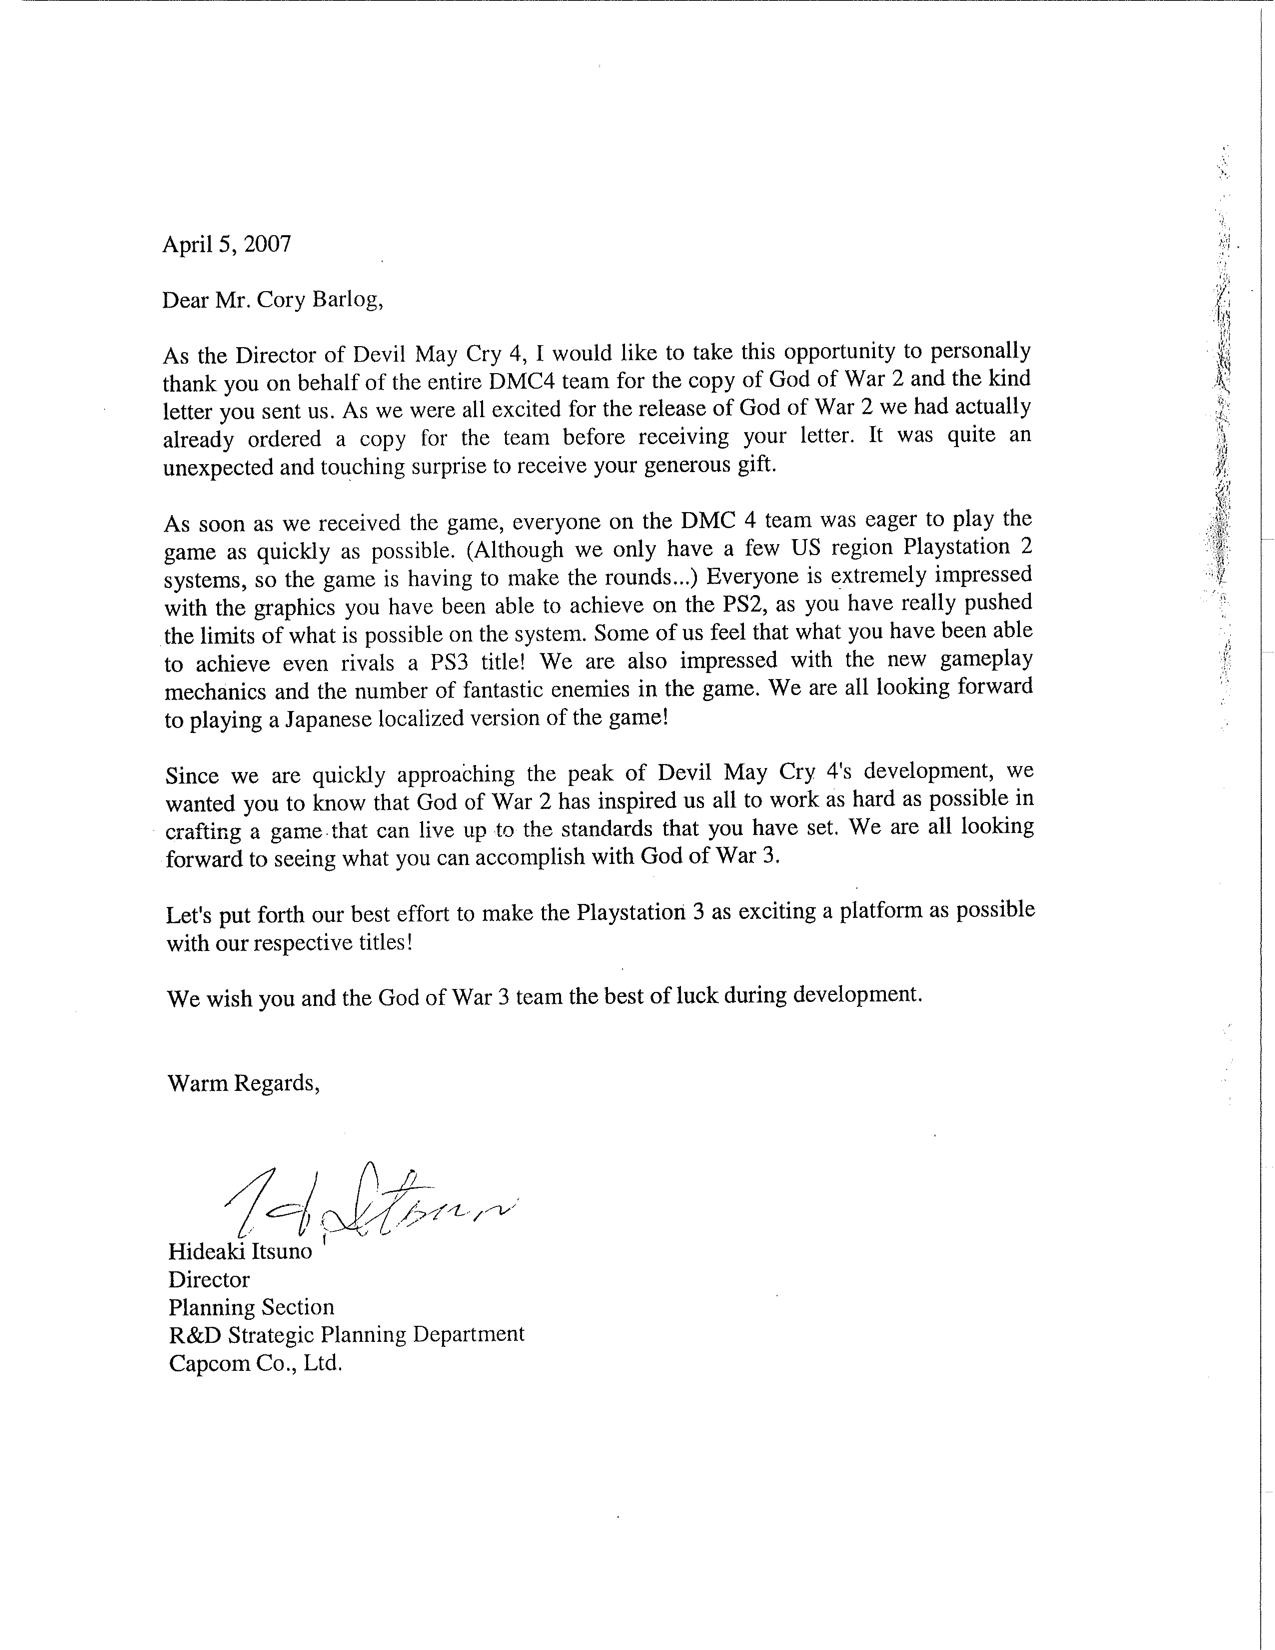 Love Letter Format Letter Of Recommendation Thank You – Love Letter Format Sample